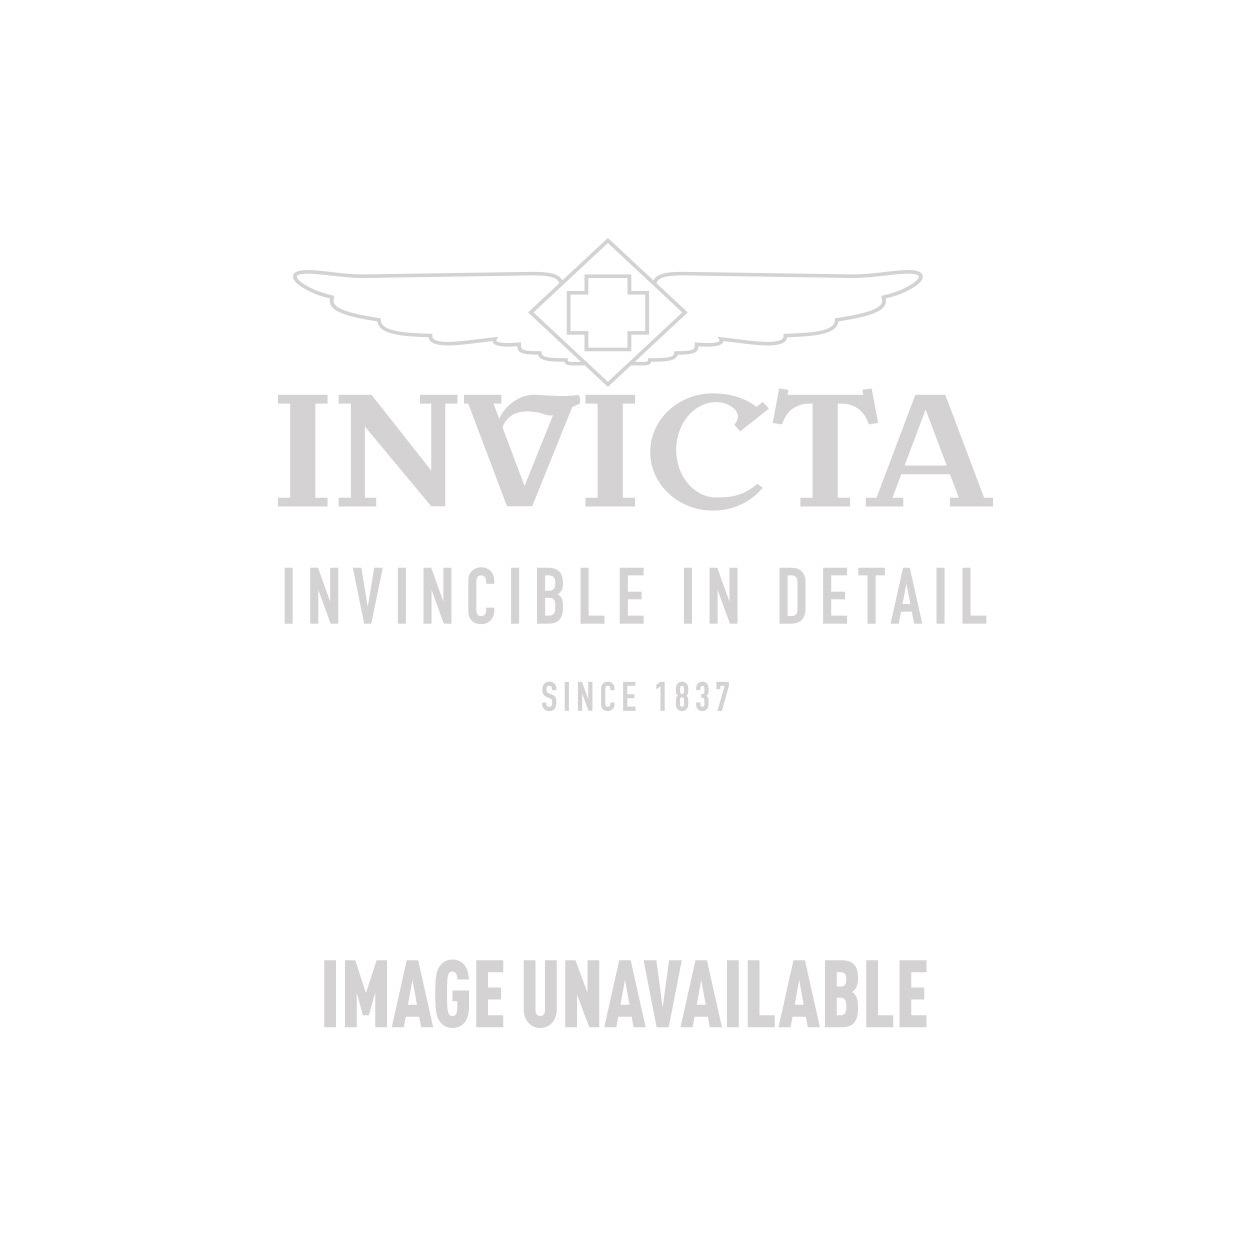 INVICTA Jewelry AISHA Rings None 13 Silver 925 and Enamel Rhodium+Brown+Burnt Orange - Model J0111